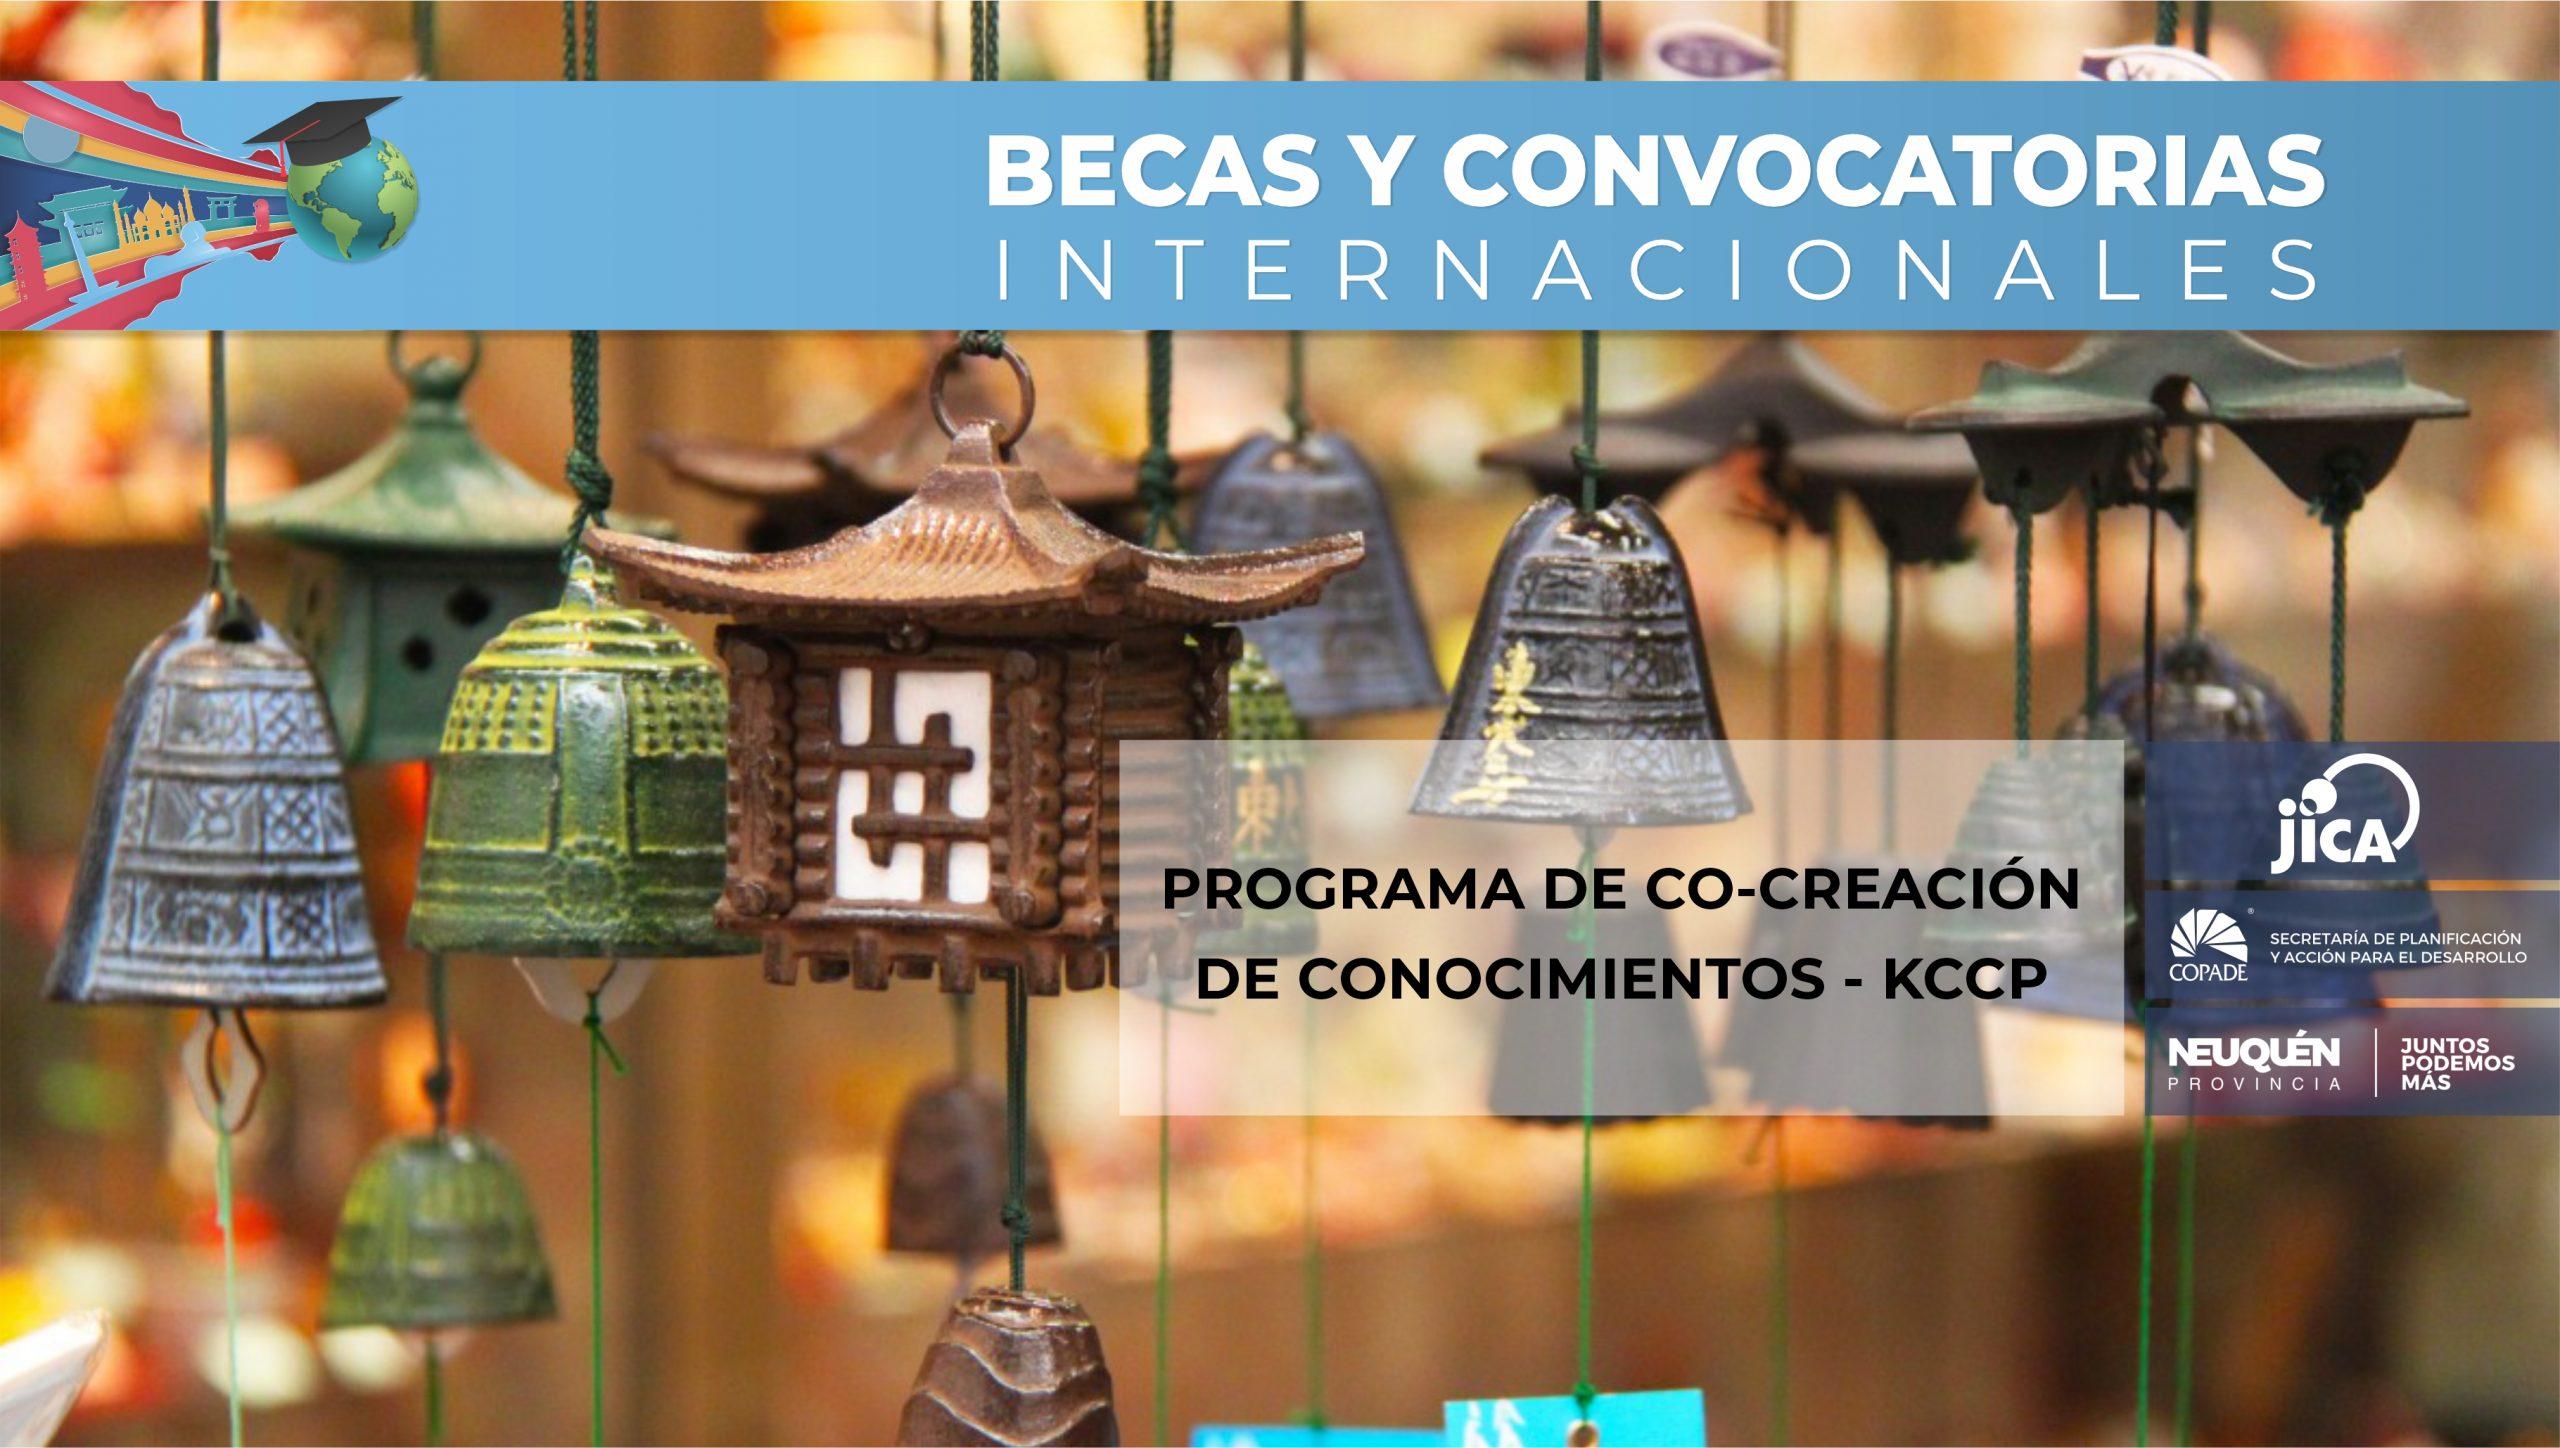 PROGRAMA DE CO-CREACIÓN DE CONOCIMIENTOS – KCCP